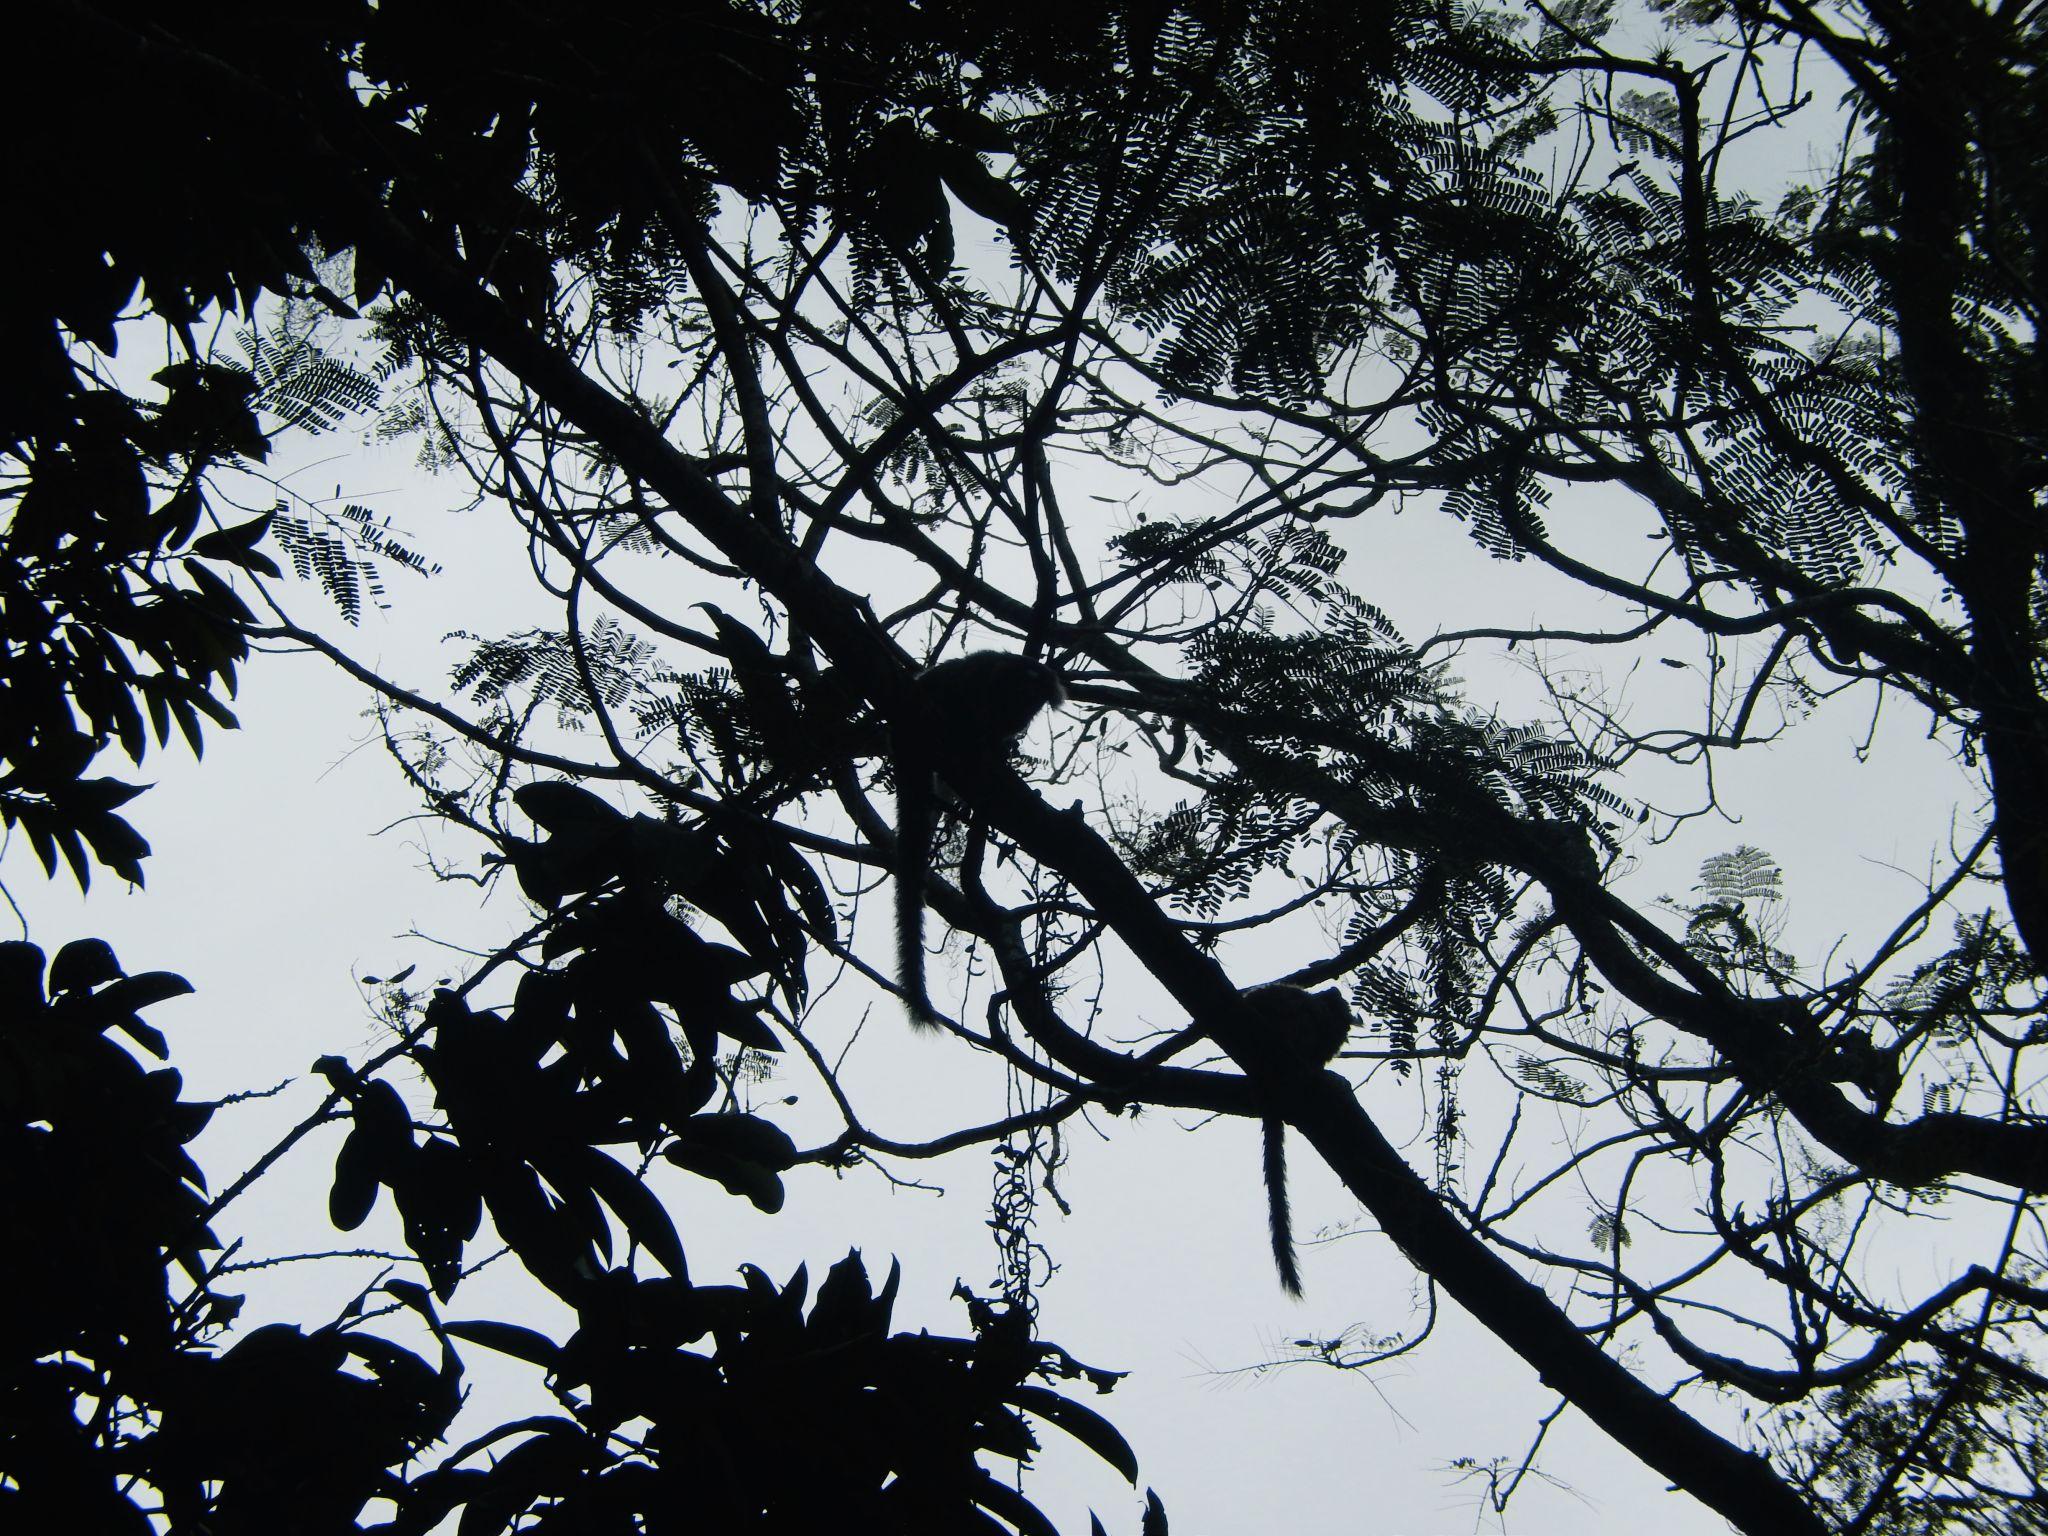 Monkey-tails-in-Rio-de-Janeiro